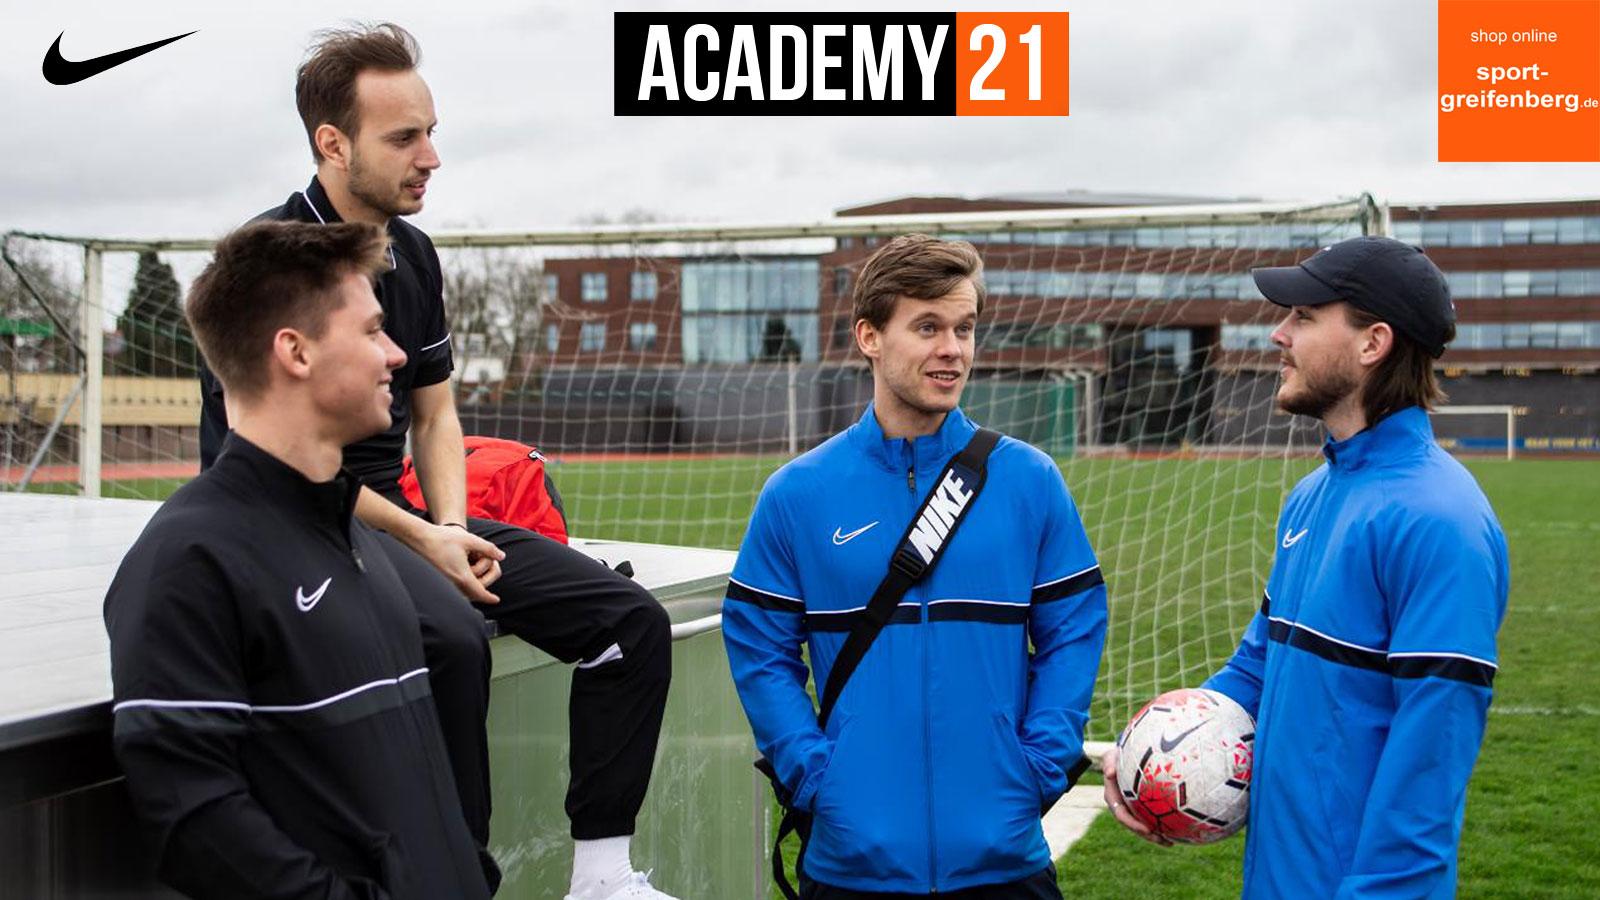 Nike Academy 21 Teamline